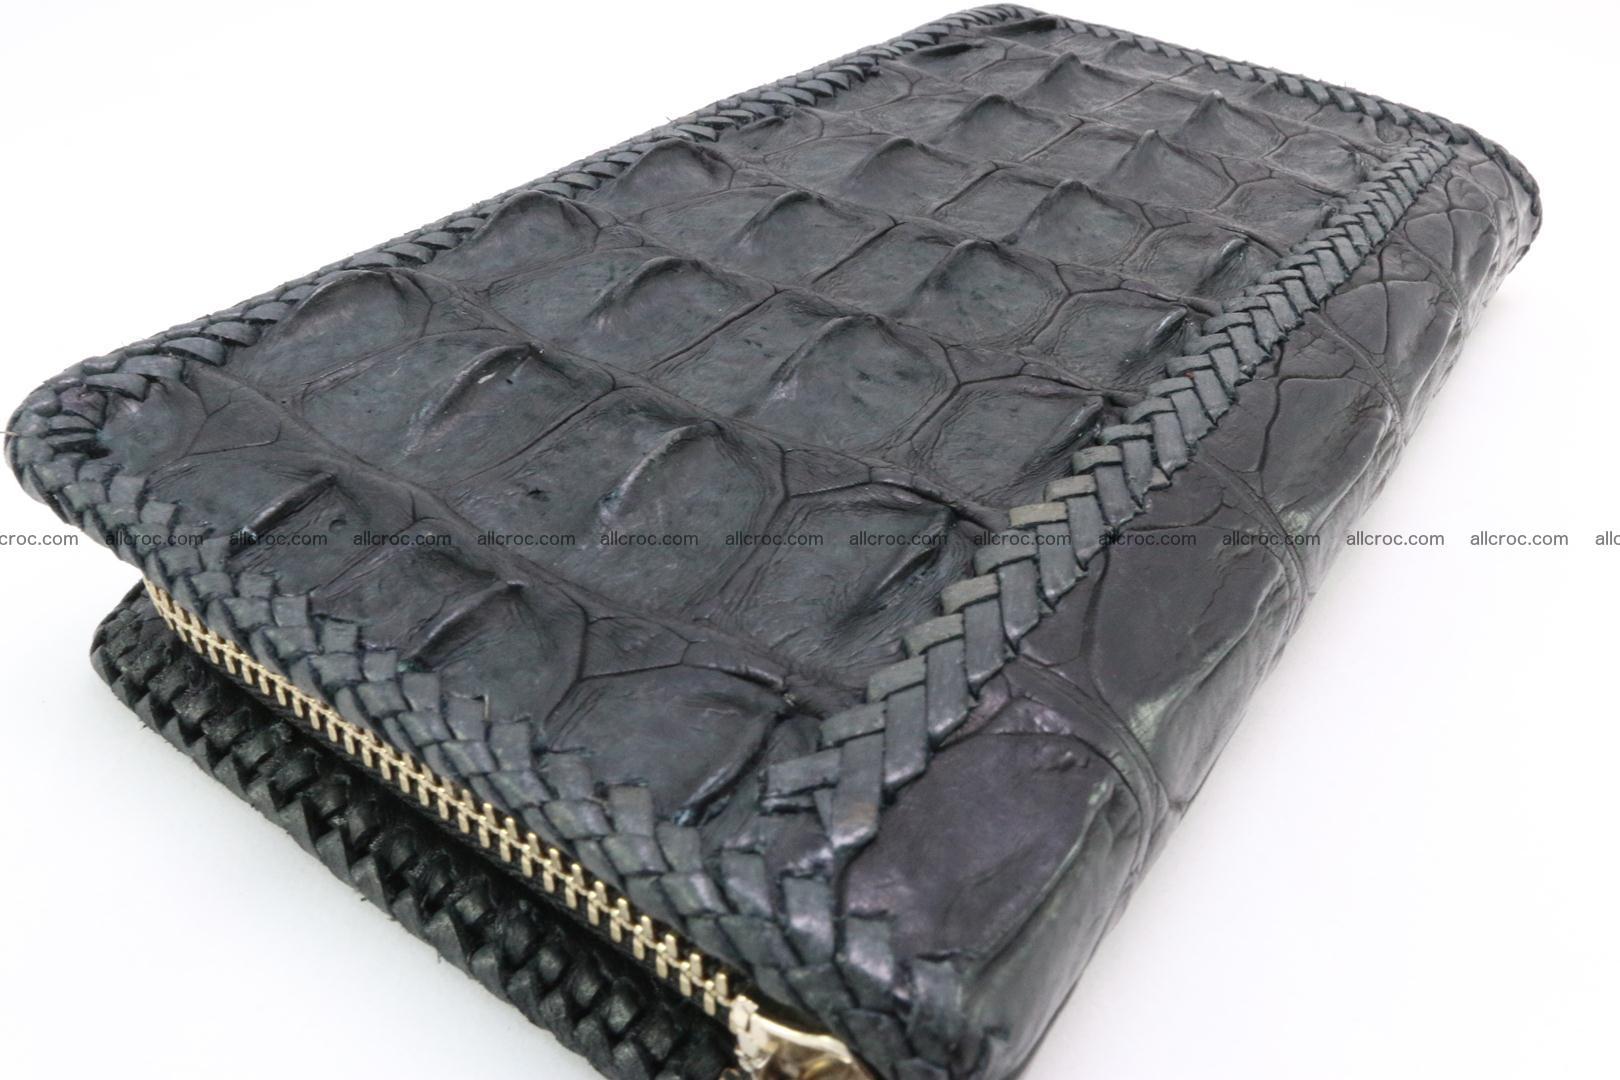 Genuine crocodile hornback wallet with zip 099 Foto 10